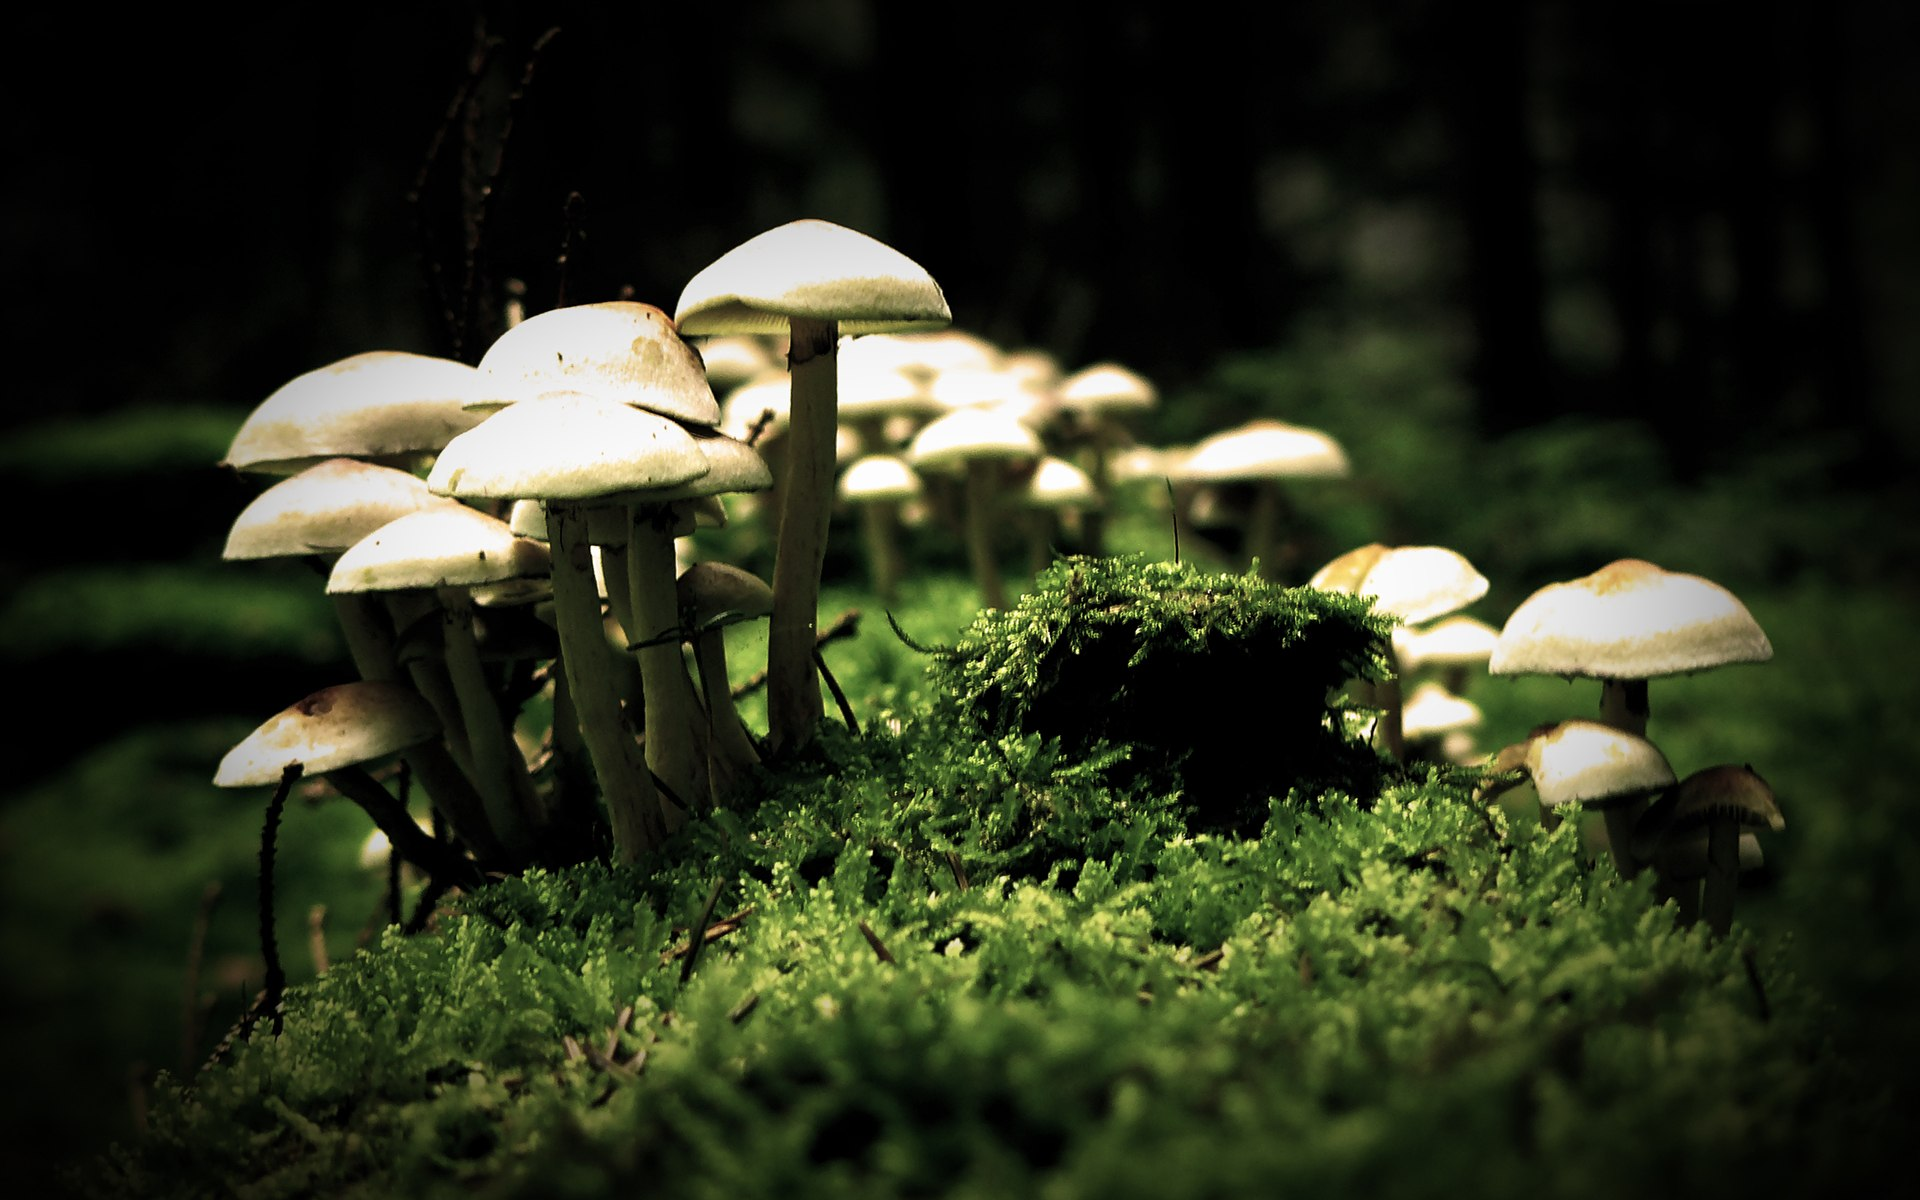 Mushrooms Nature